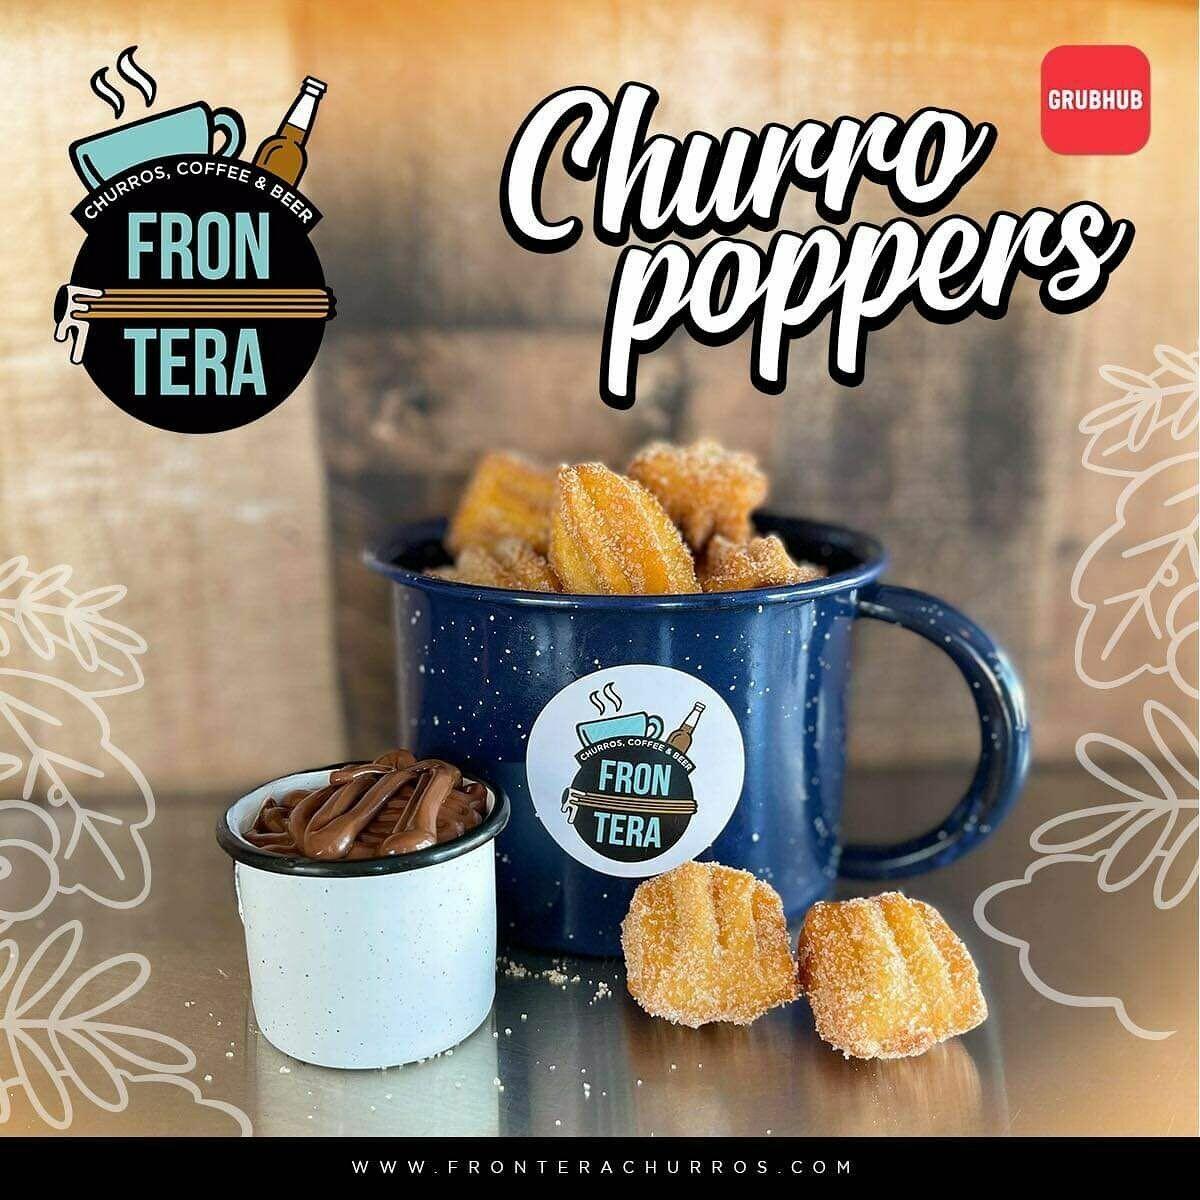 Churro Poppers